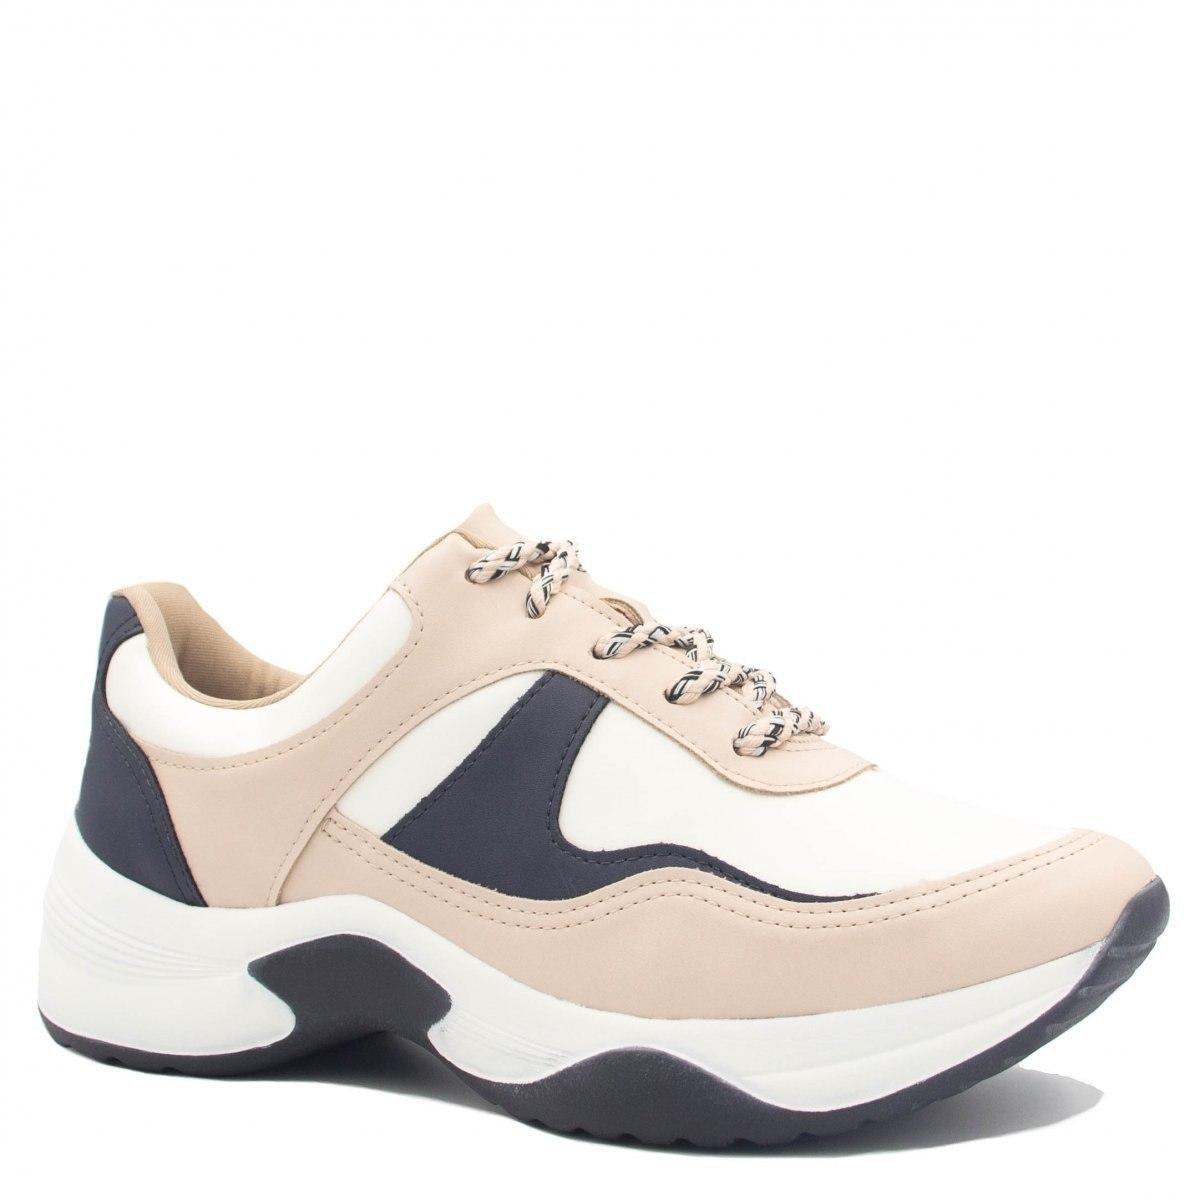 c9b9330da Tênis Sneaker Dakota Chunky Recortes Feminino - Compre Agora | Zattini